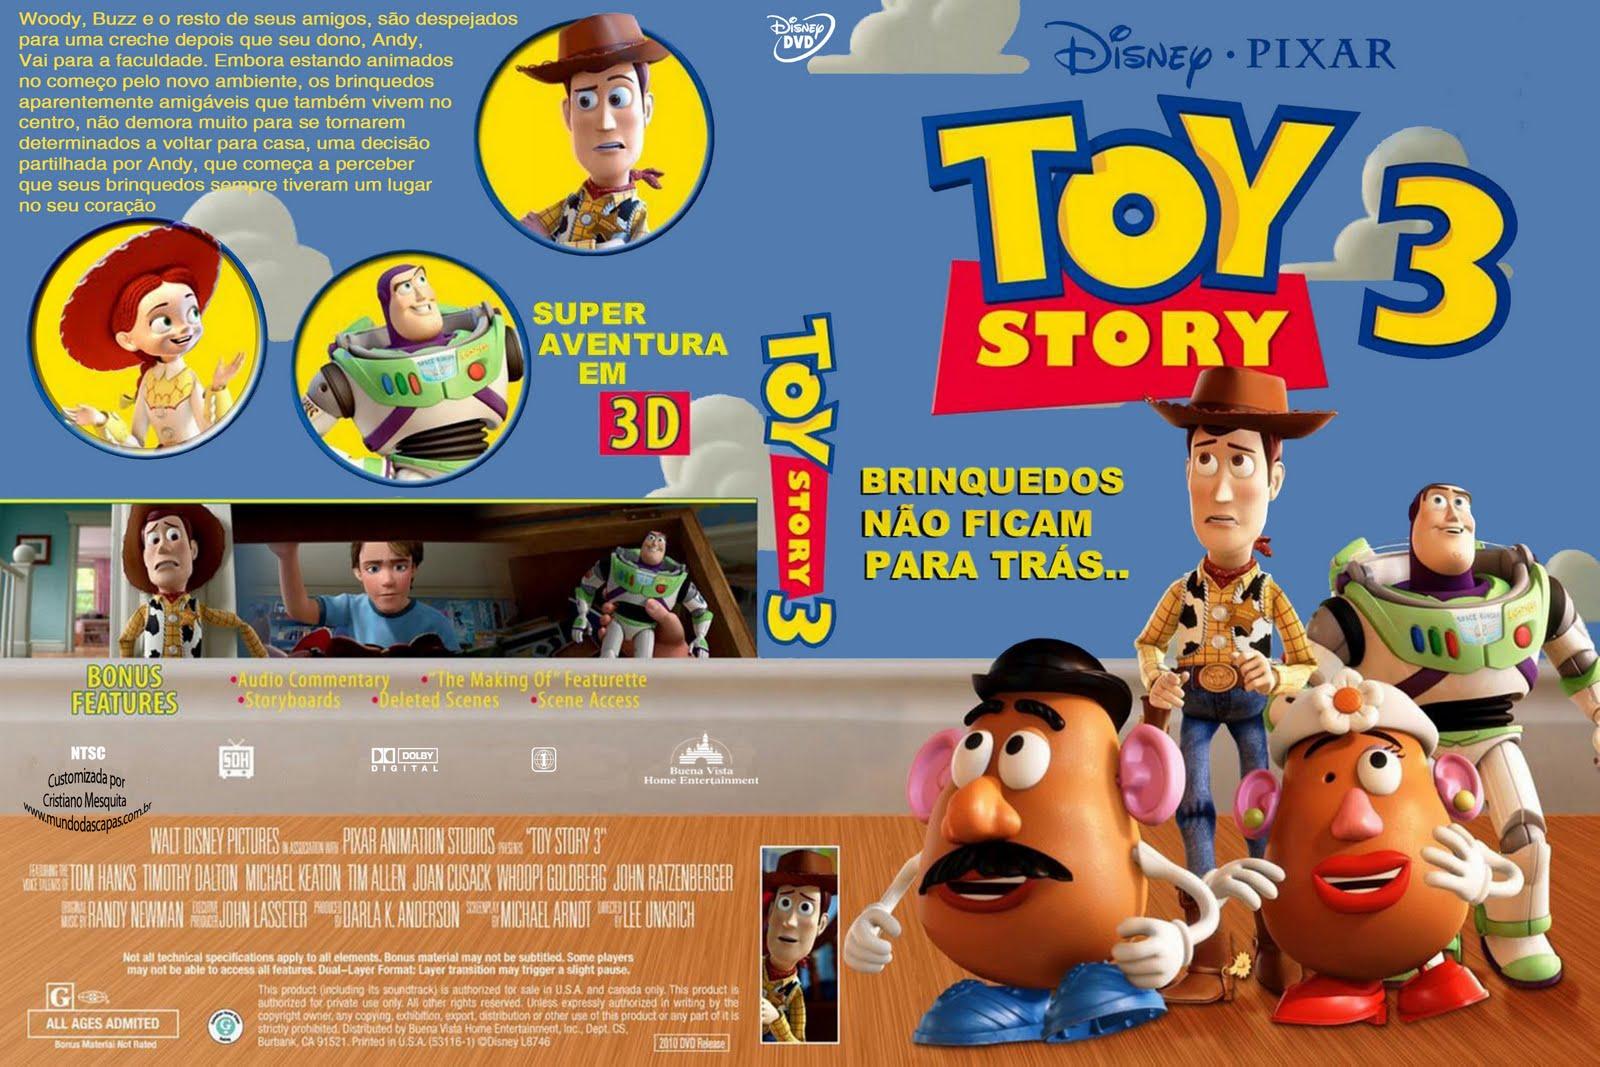 Toy Story – Trilogia (PT-PT) Toy+Story+3+%28customizada%29